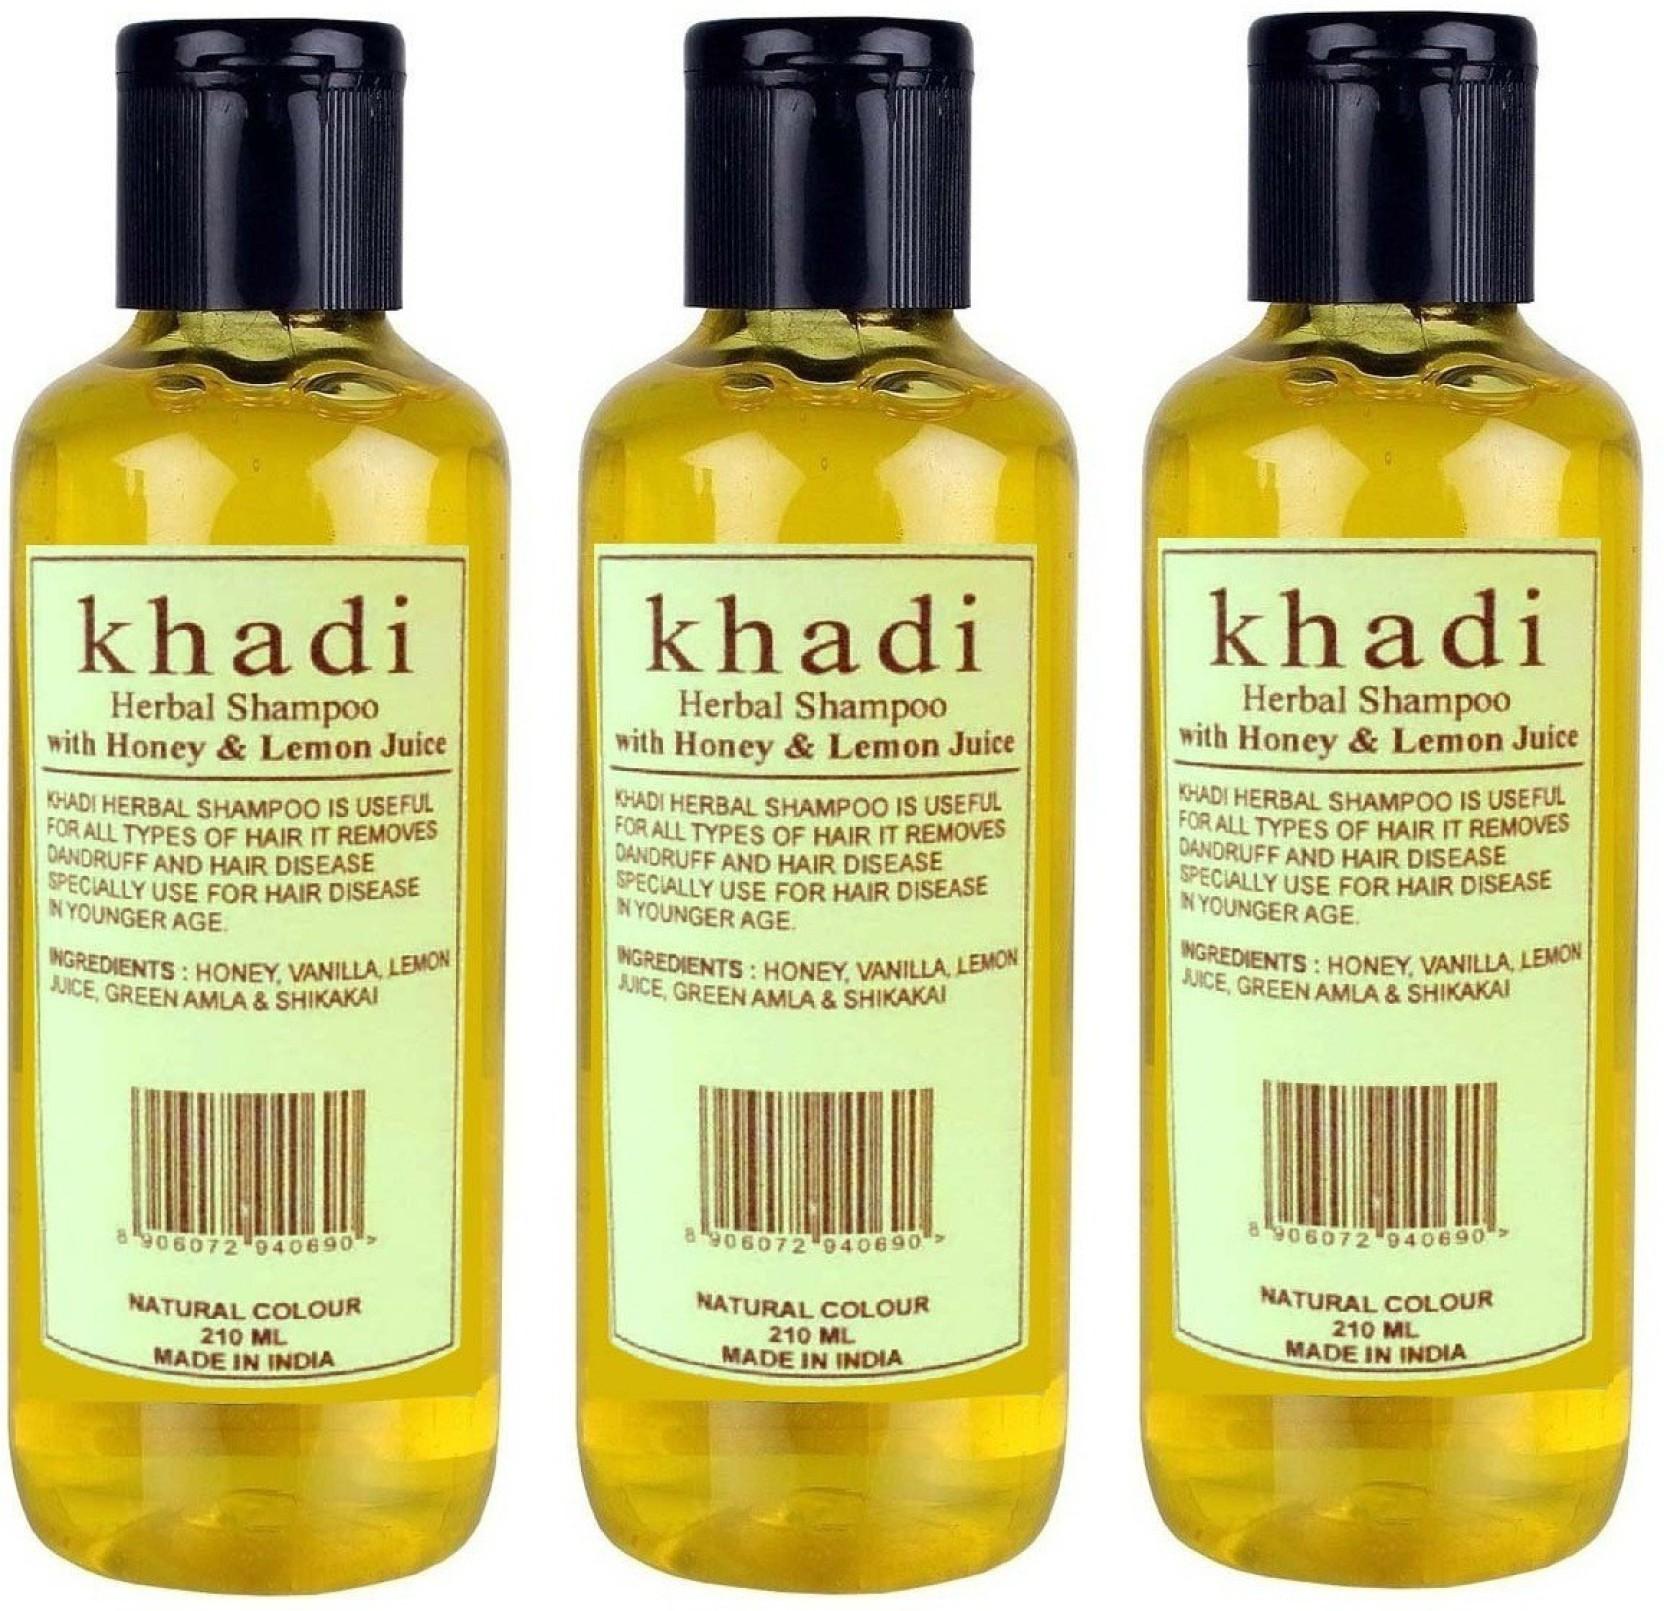 Khadi Herbal Lemon &Honey Shampoo[PACK OF 3] - Price in